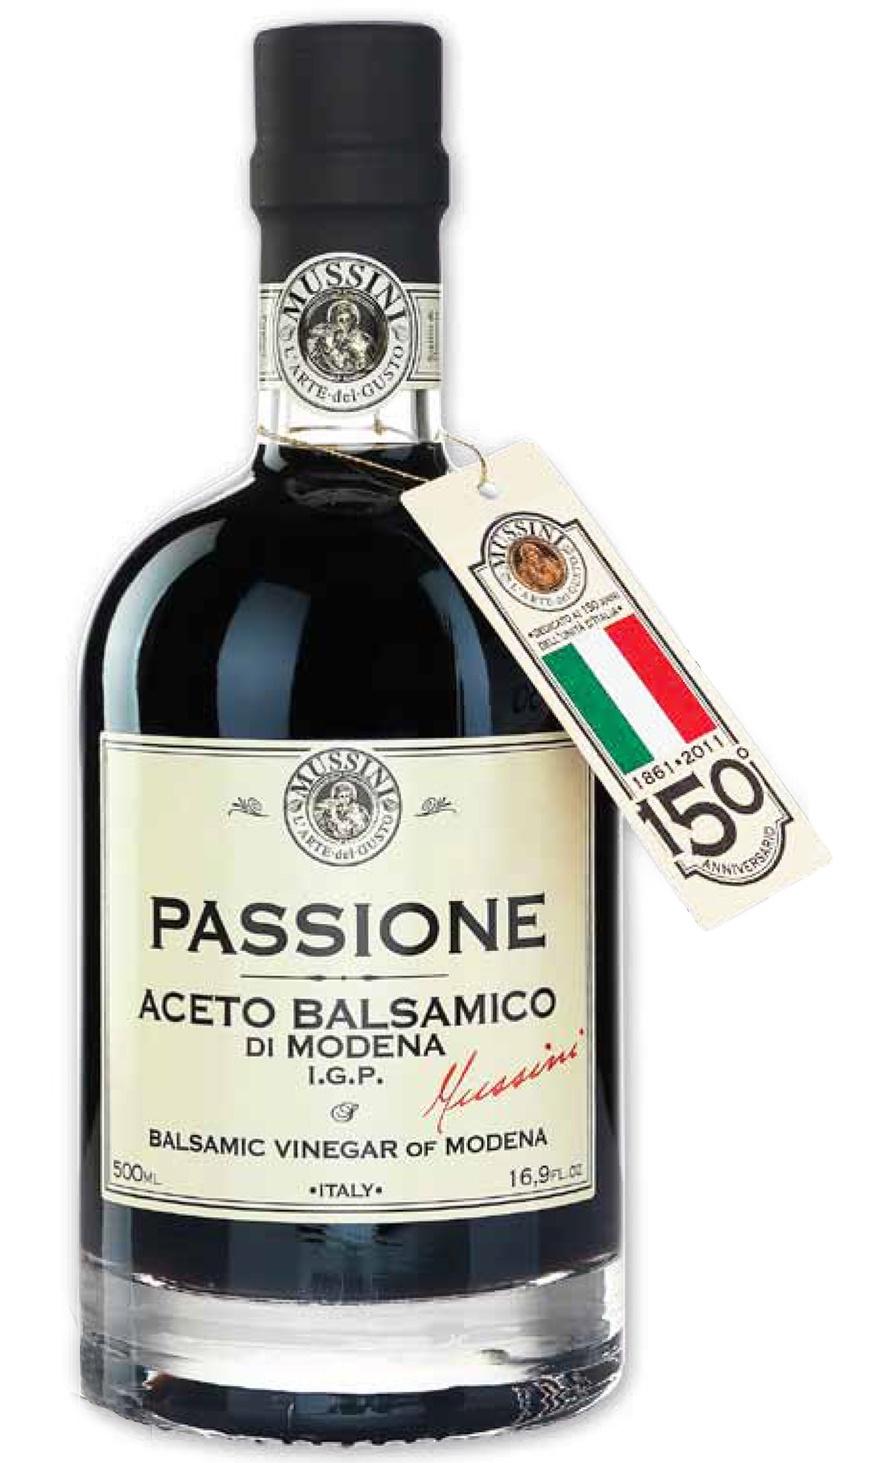 Mussini Balsamico di Modena IGP